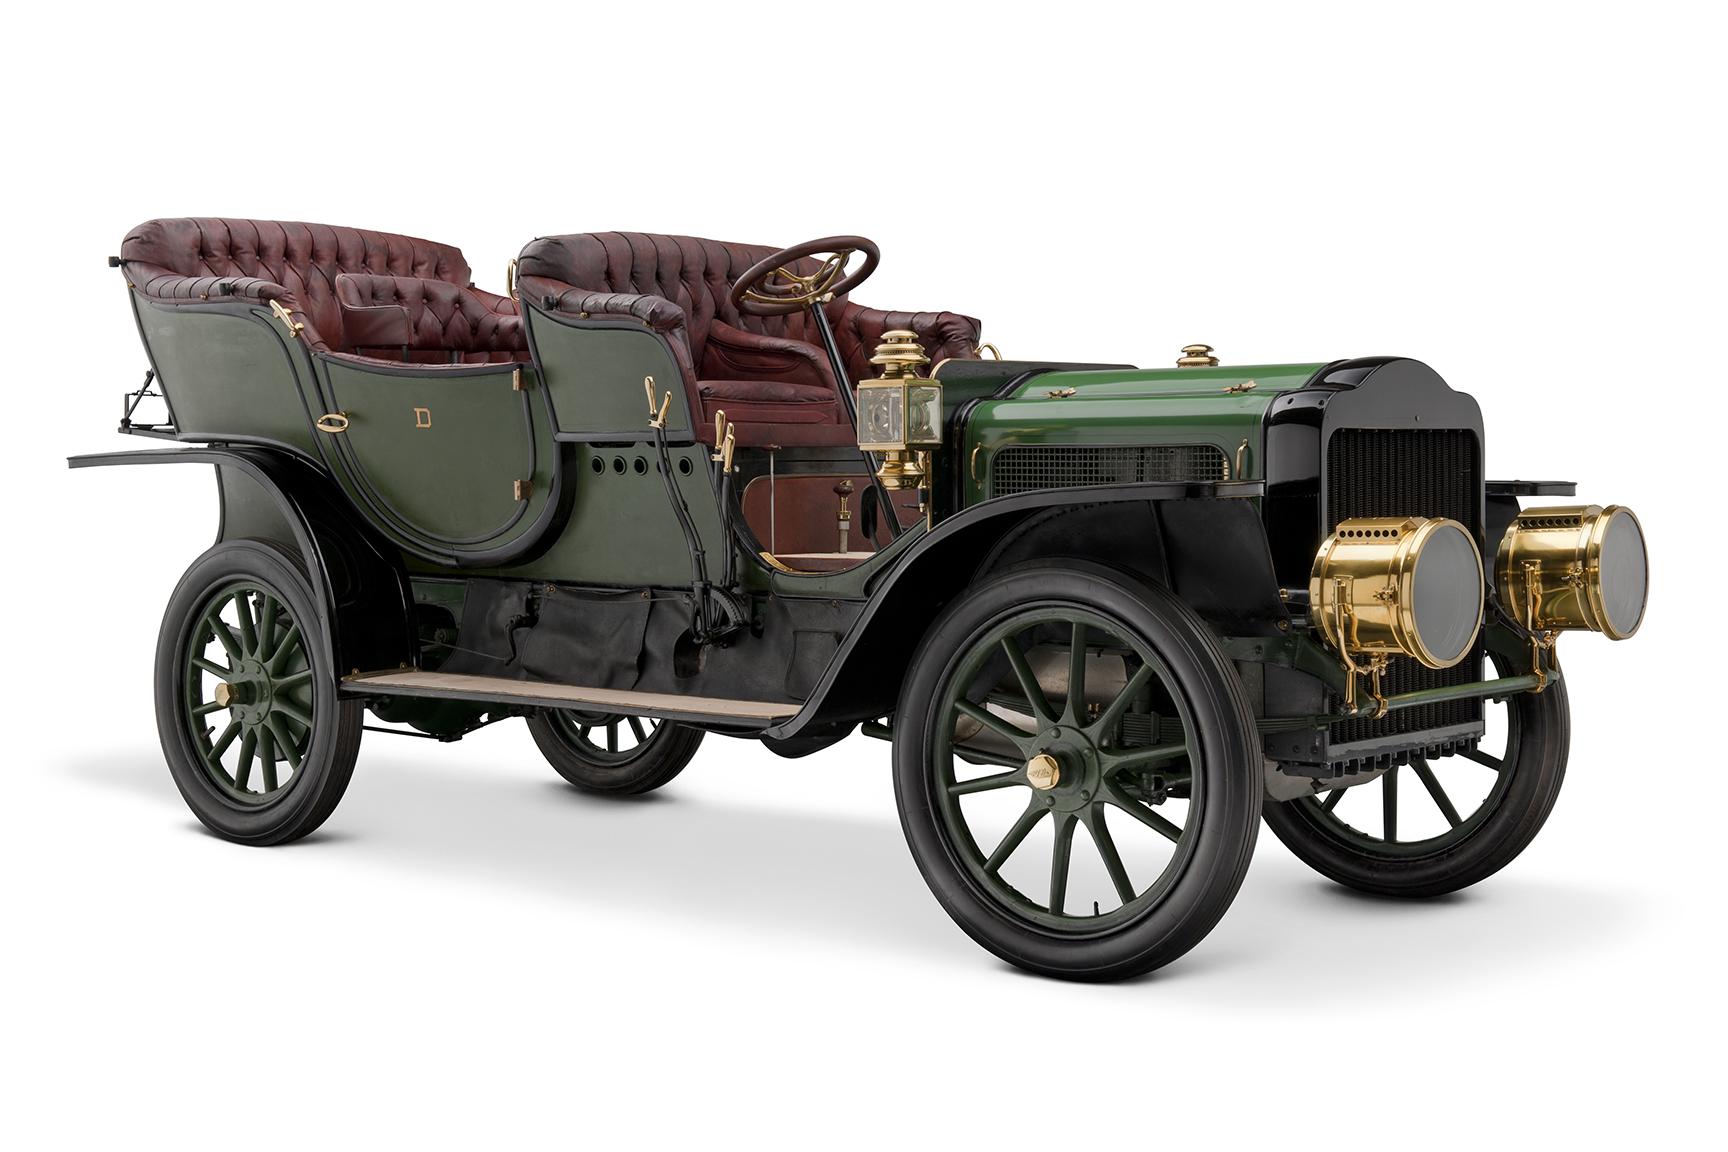 1907 White Model G Touring Car front 3/4